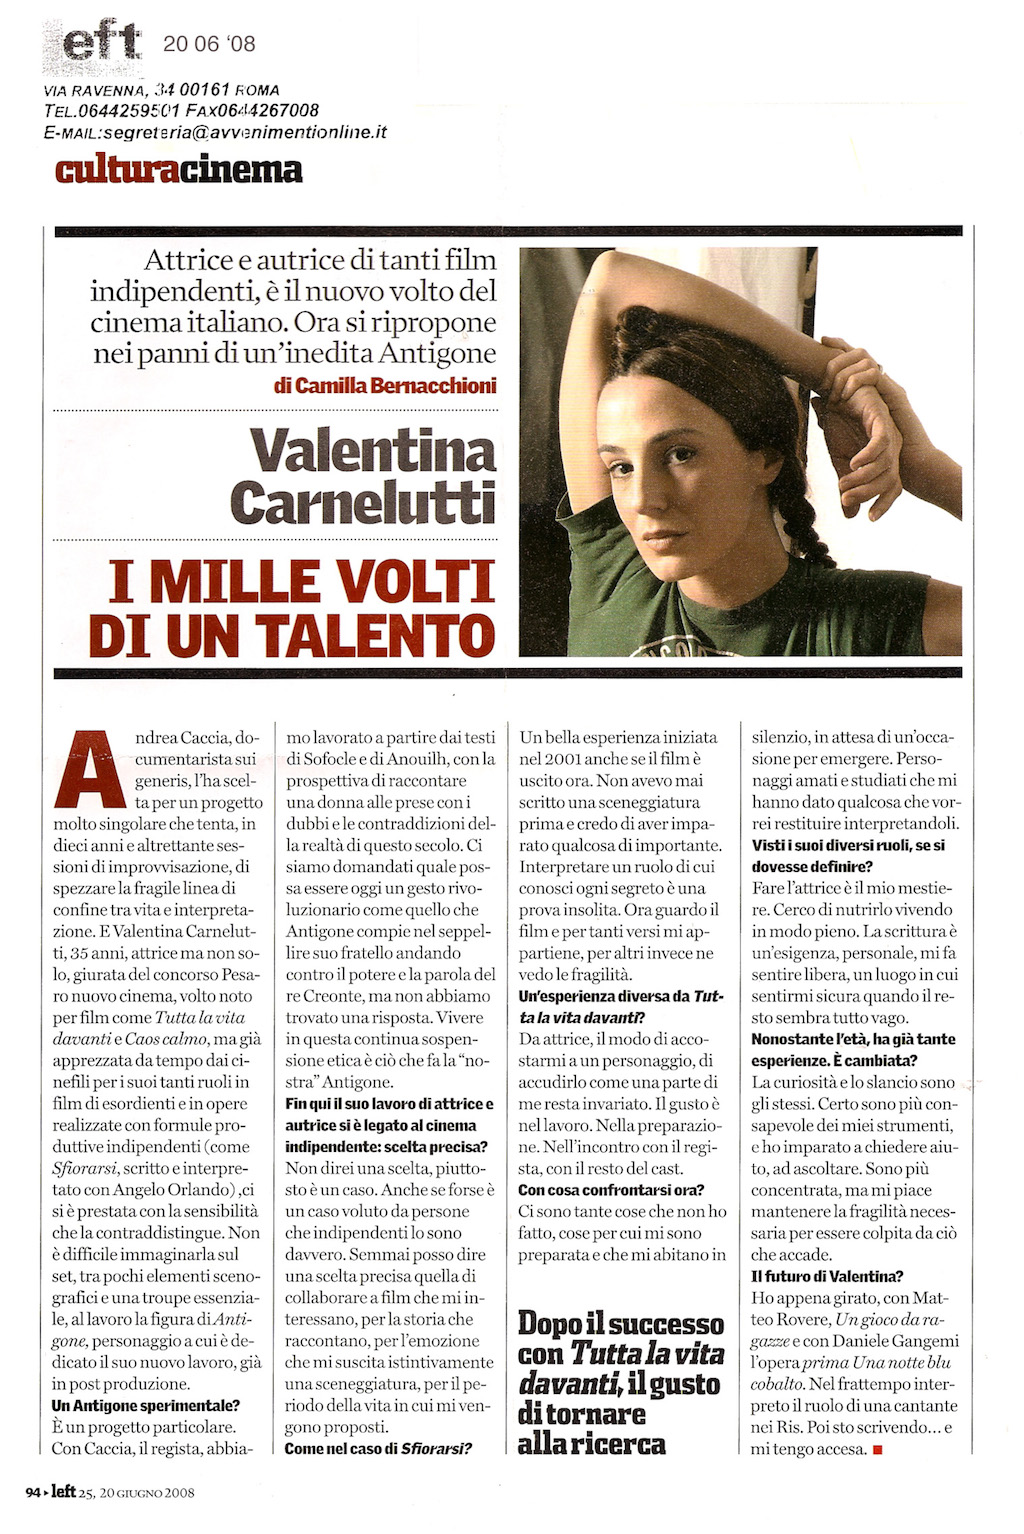 Valentina Carnelutti- 20 06 08 LEFT